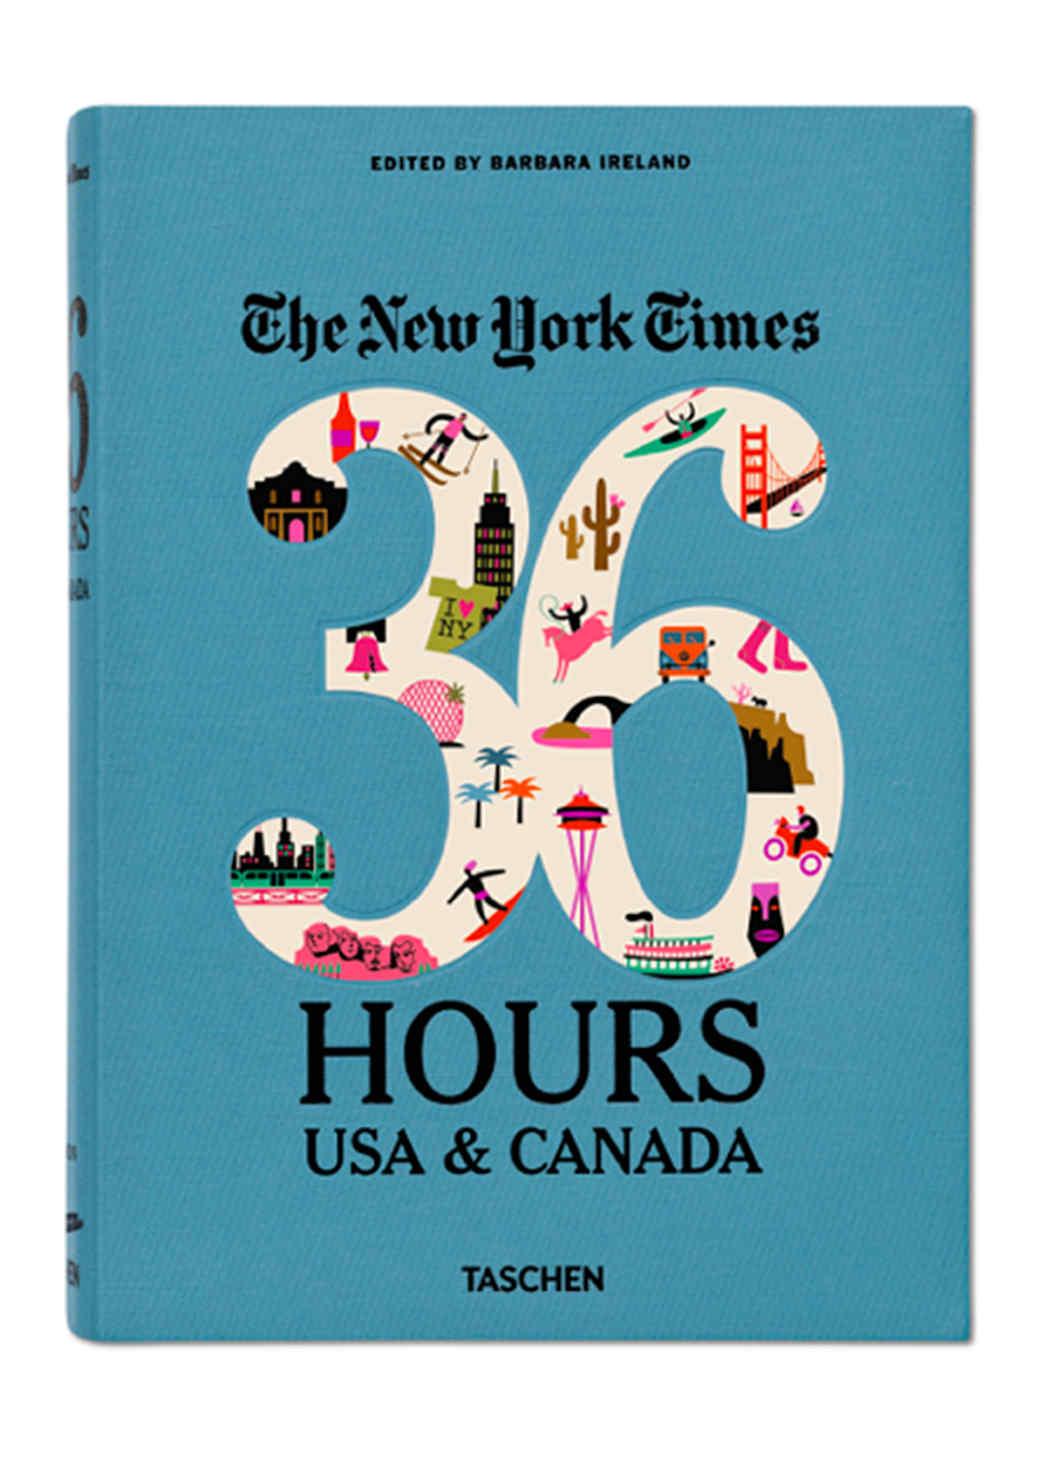 new-york-times-36-hours-book-1015.jpg (skyword:196078)